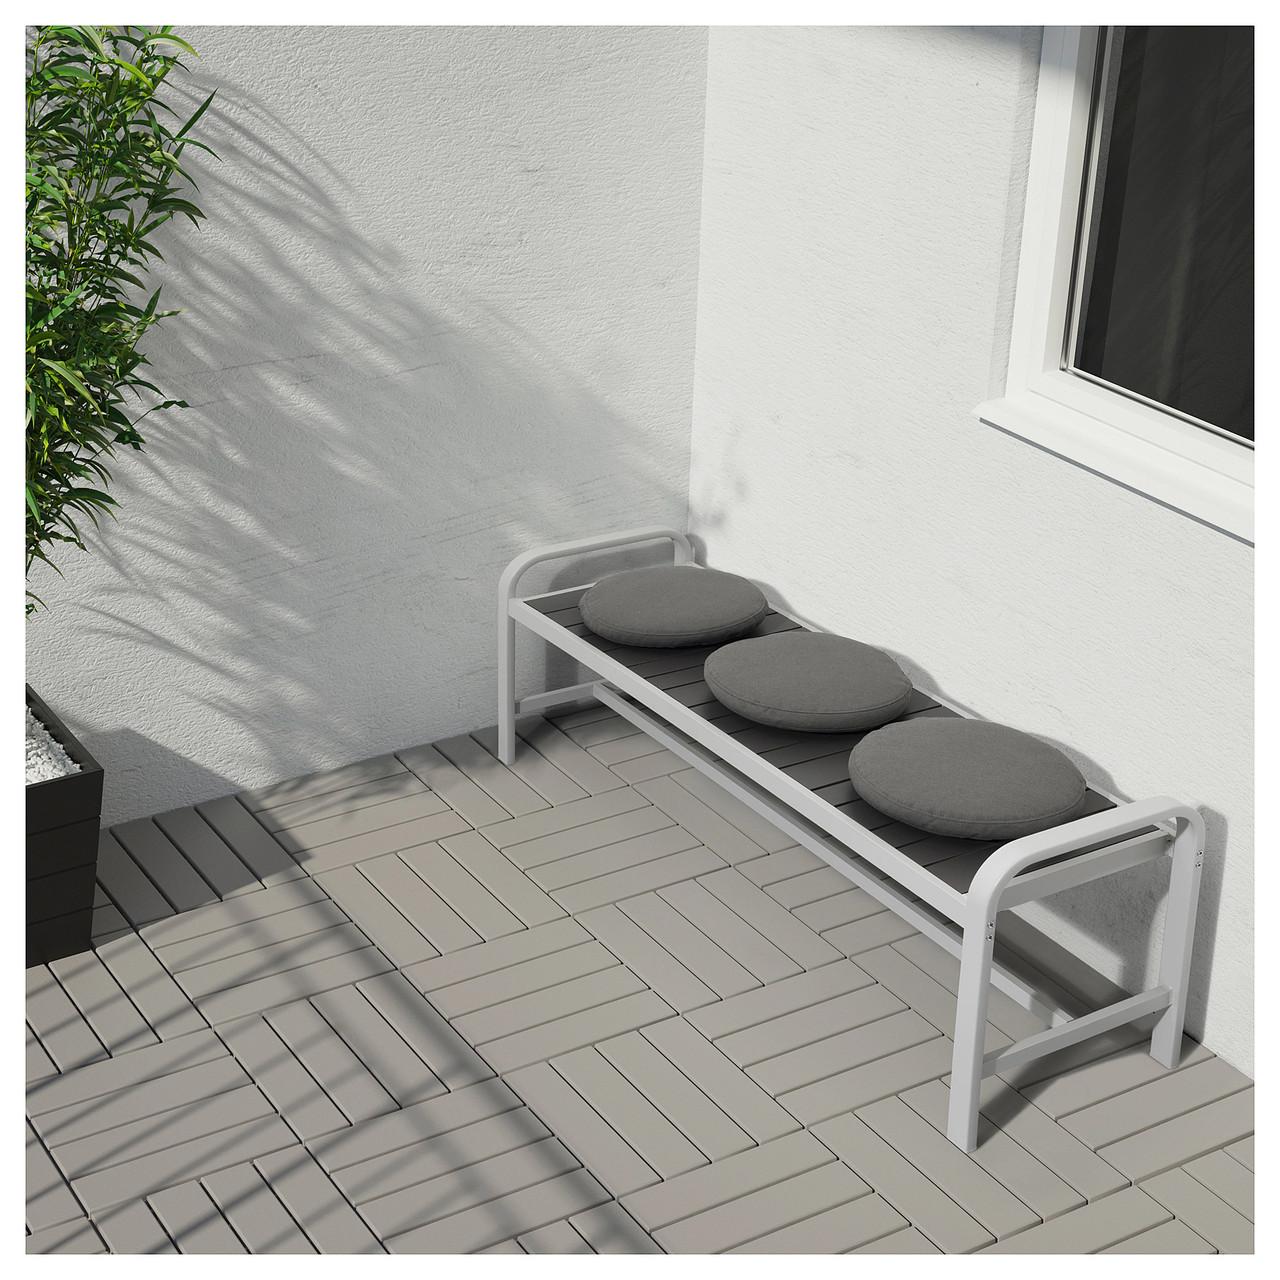 Подушка для стула FROSON/DUVHOLMEN круглая